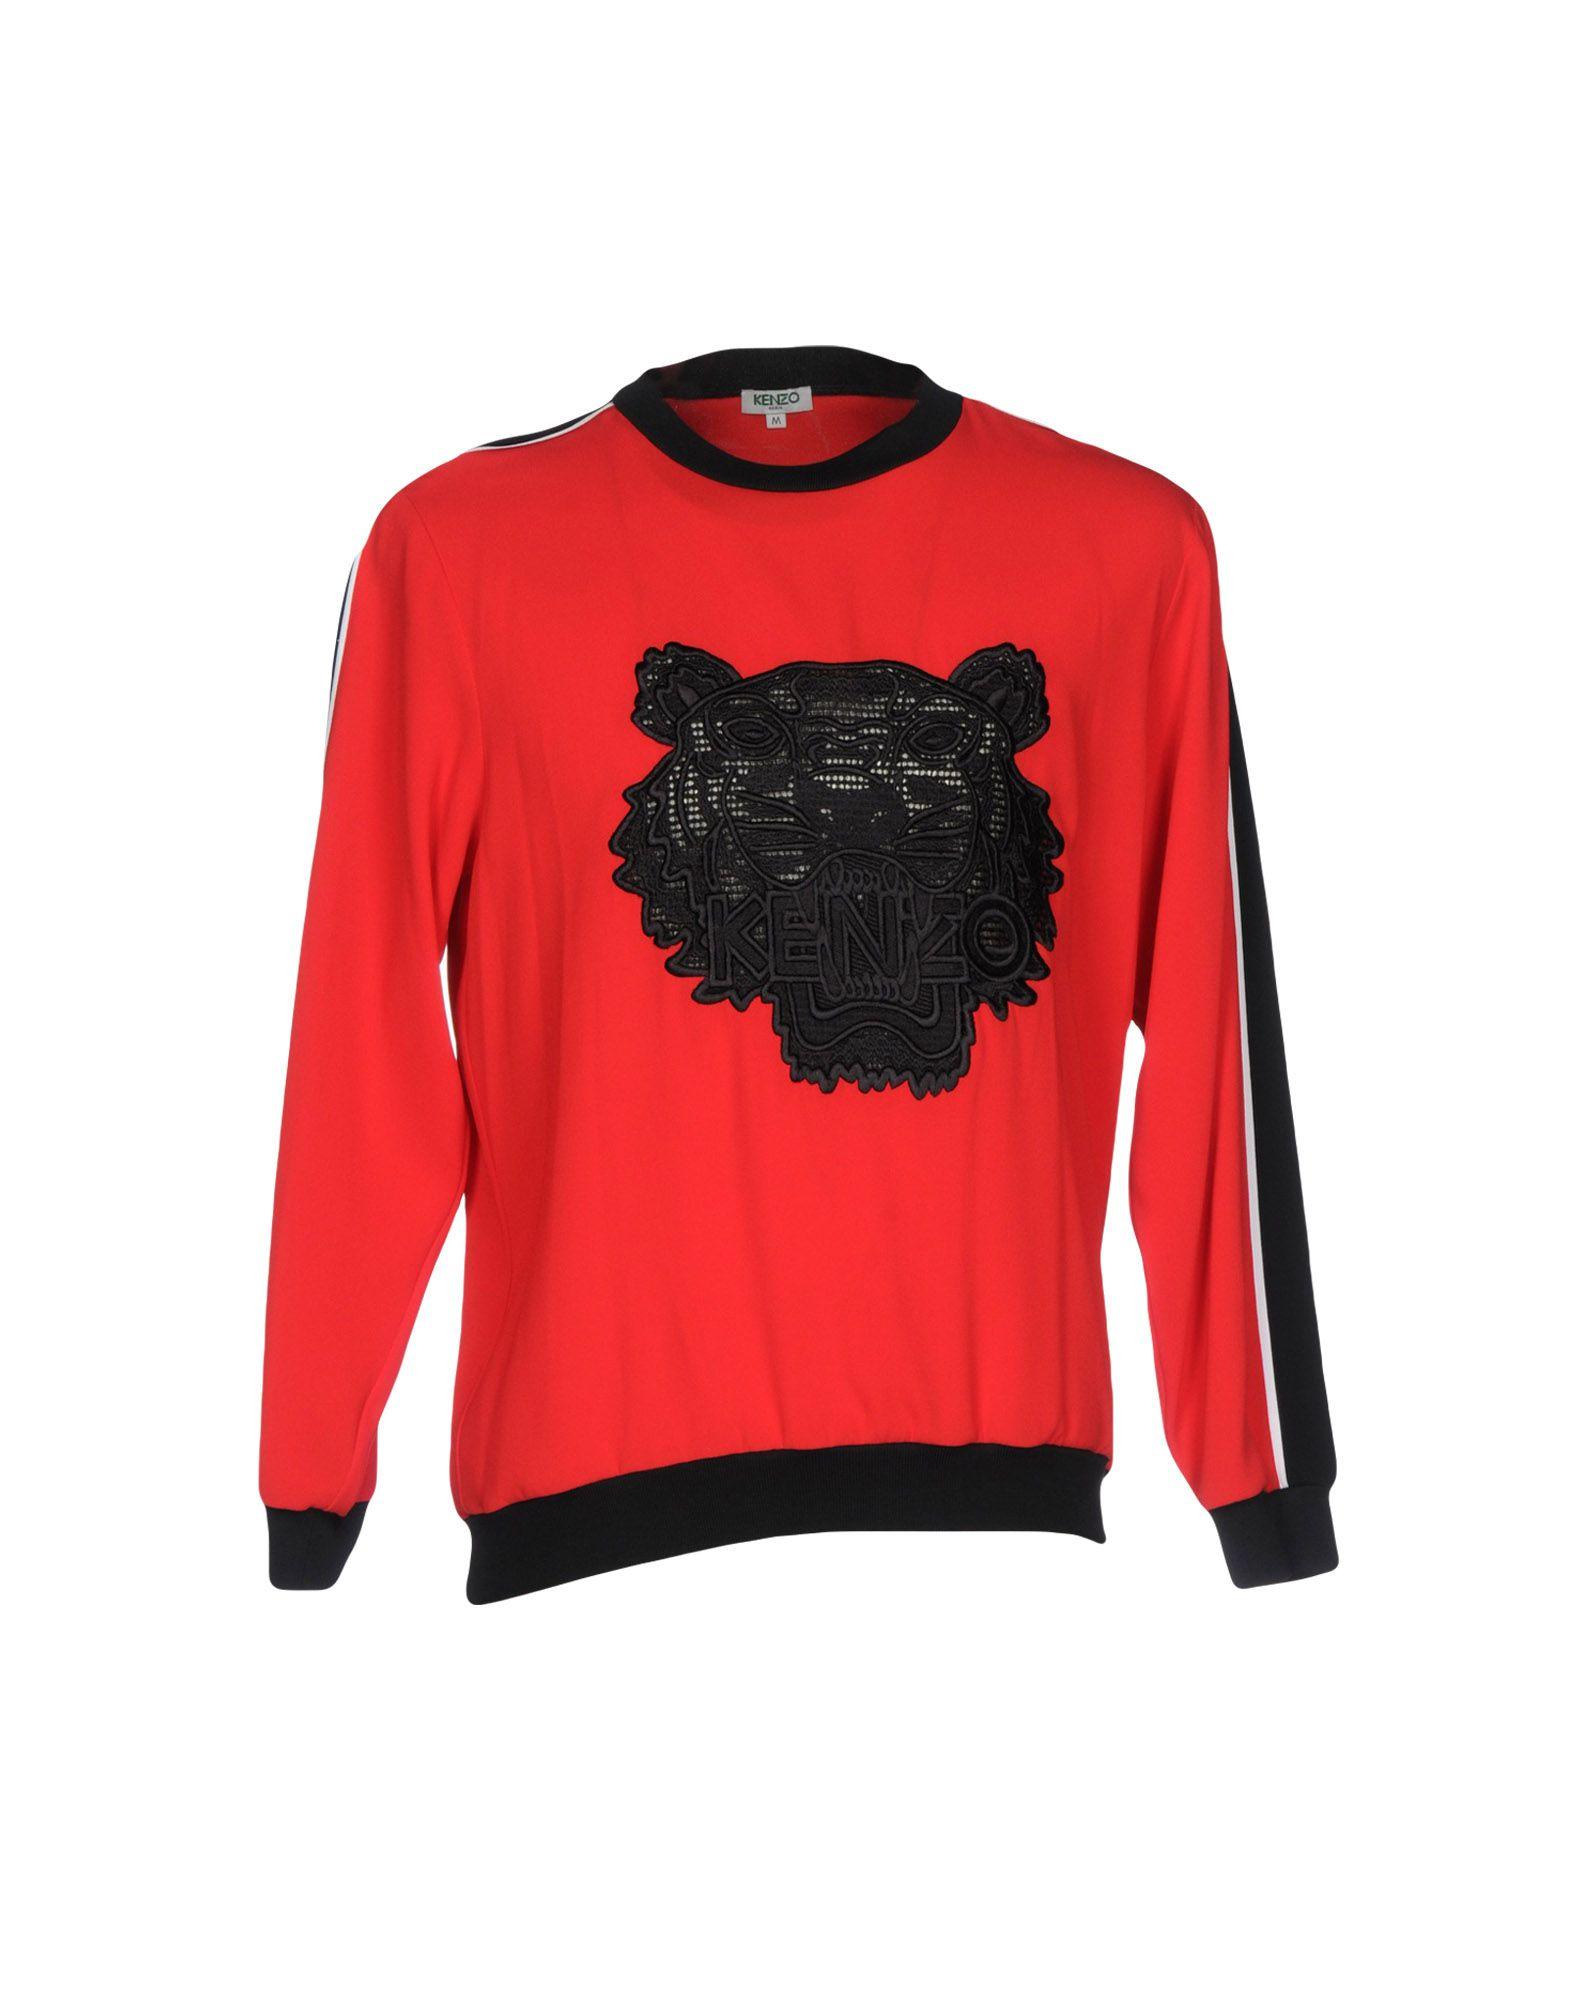 e5a06026b1e1 Shirt Palettes Sweat Canapé Homme Kenzo dnwqYwA